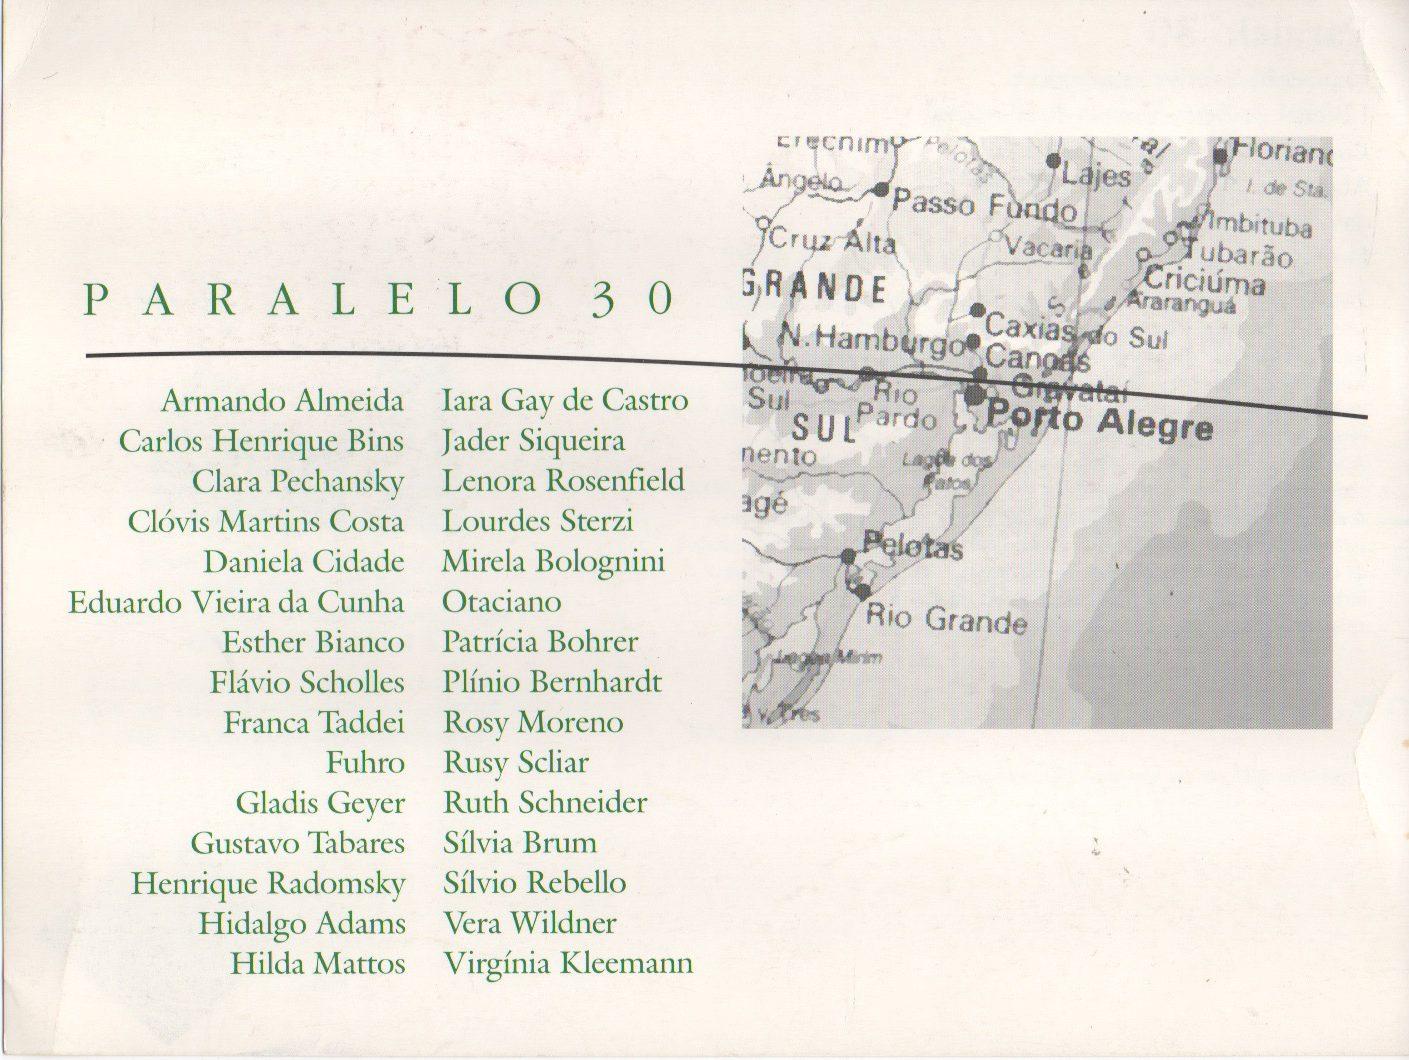 Paralelo 30, 1997